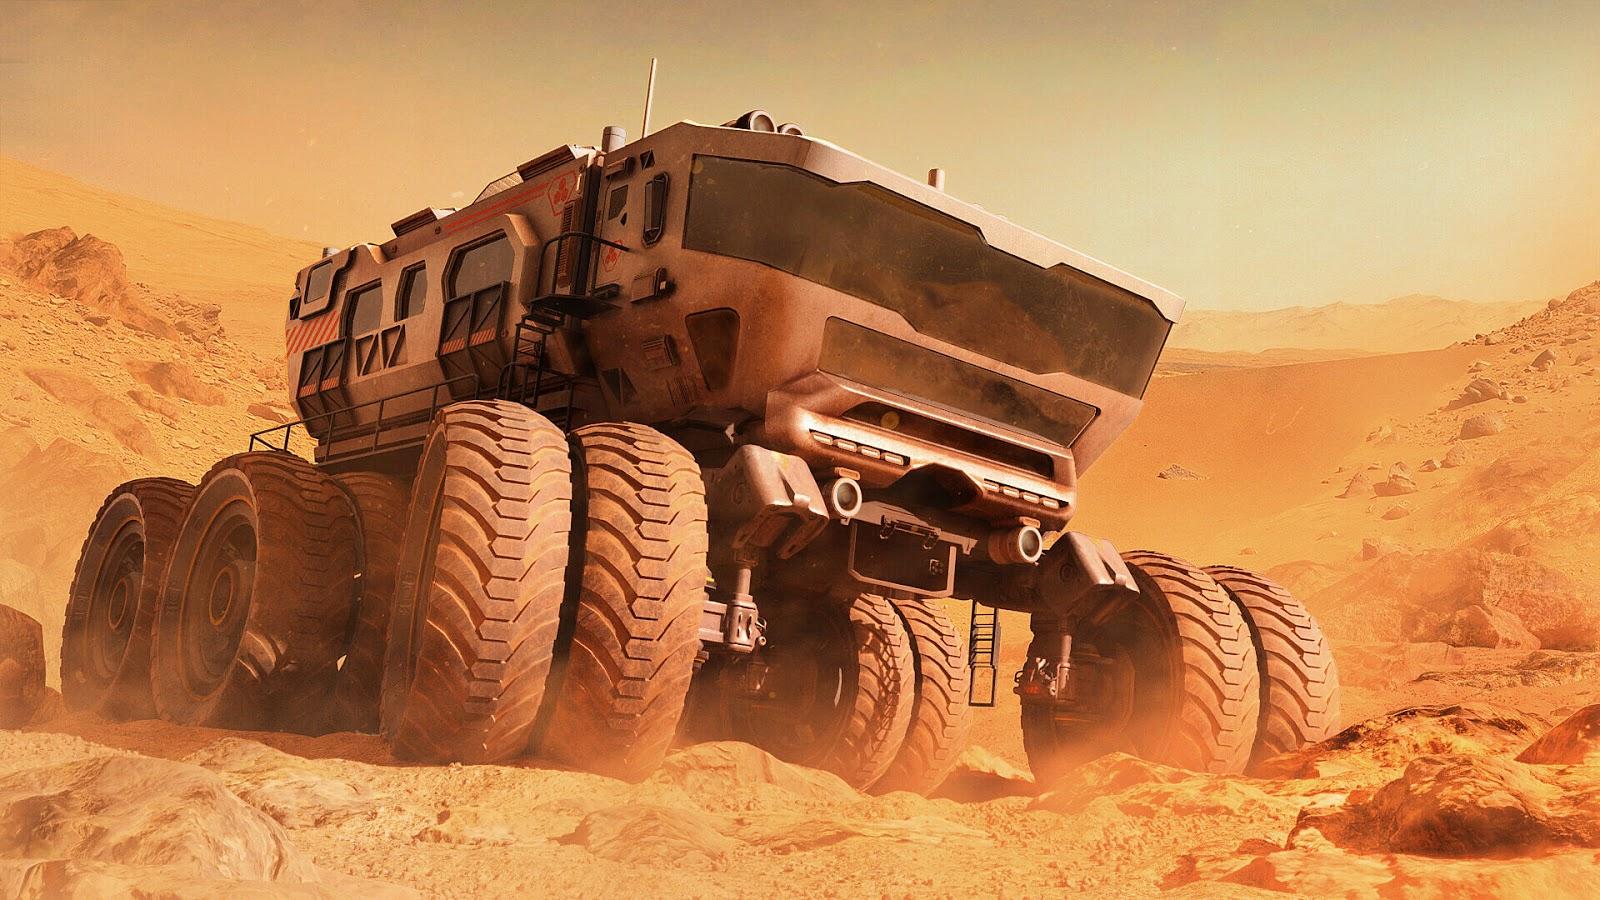 mars Exploration Rover wallpaper hd